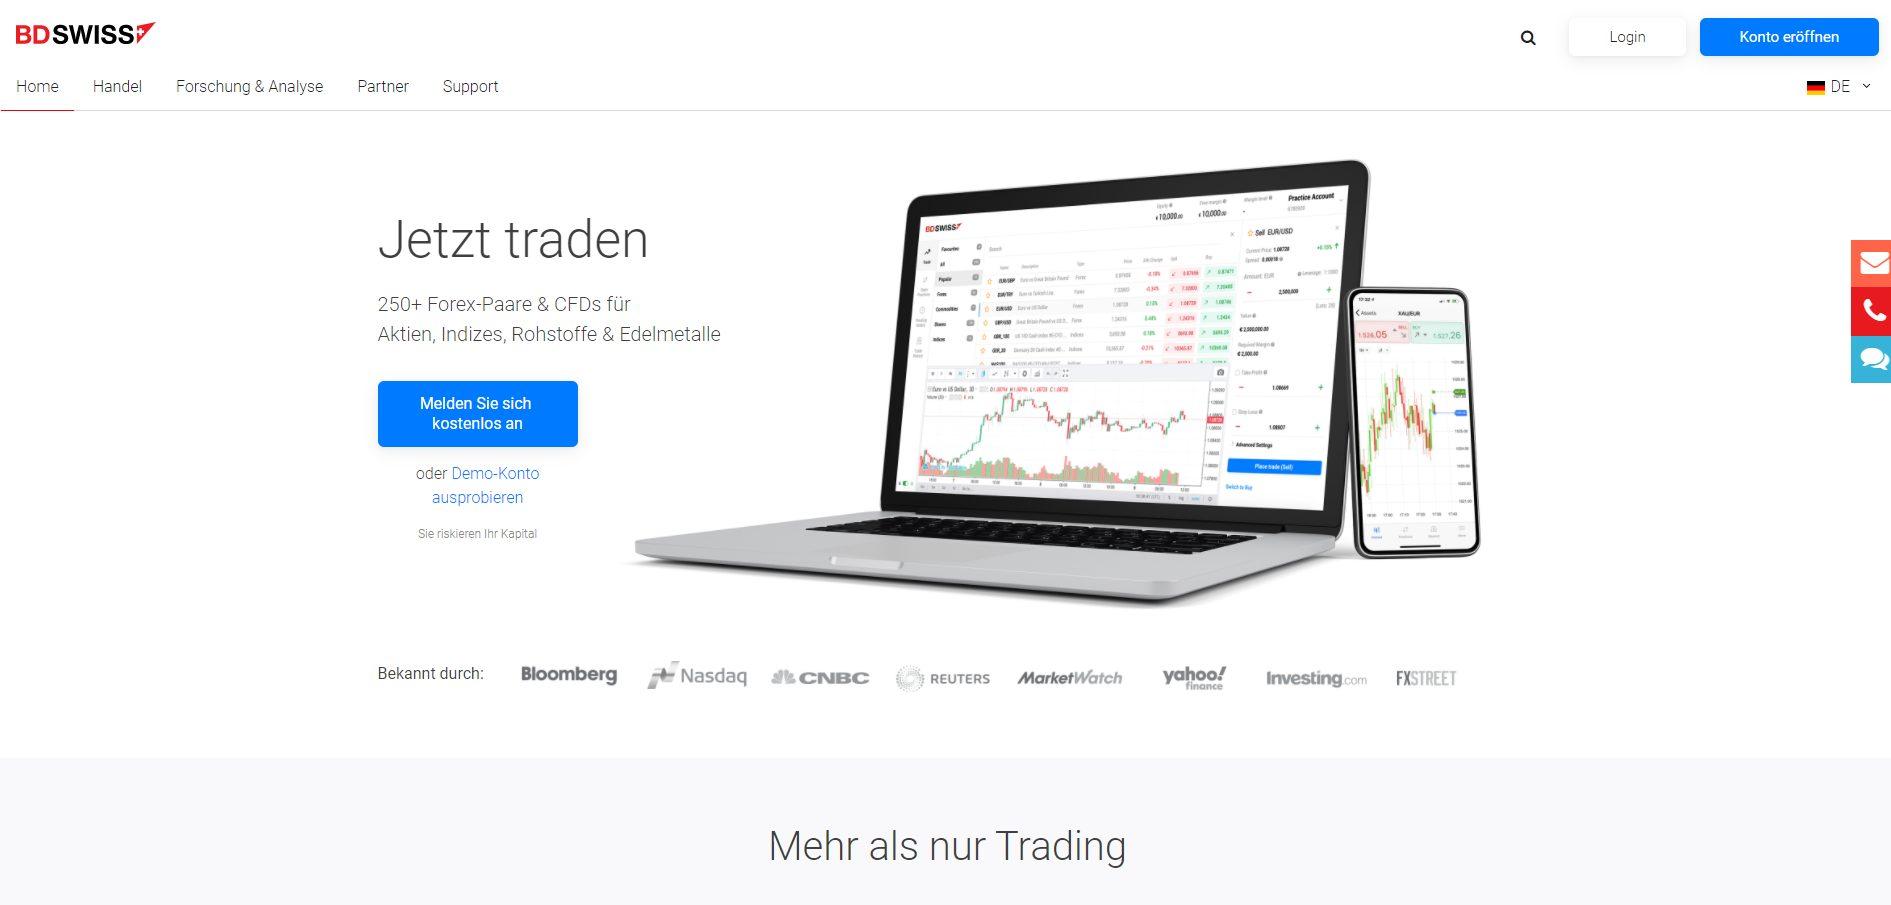 BDSwiss Forex Broker Homepage Screenshot